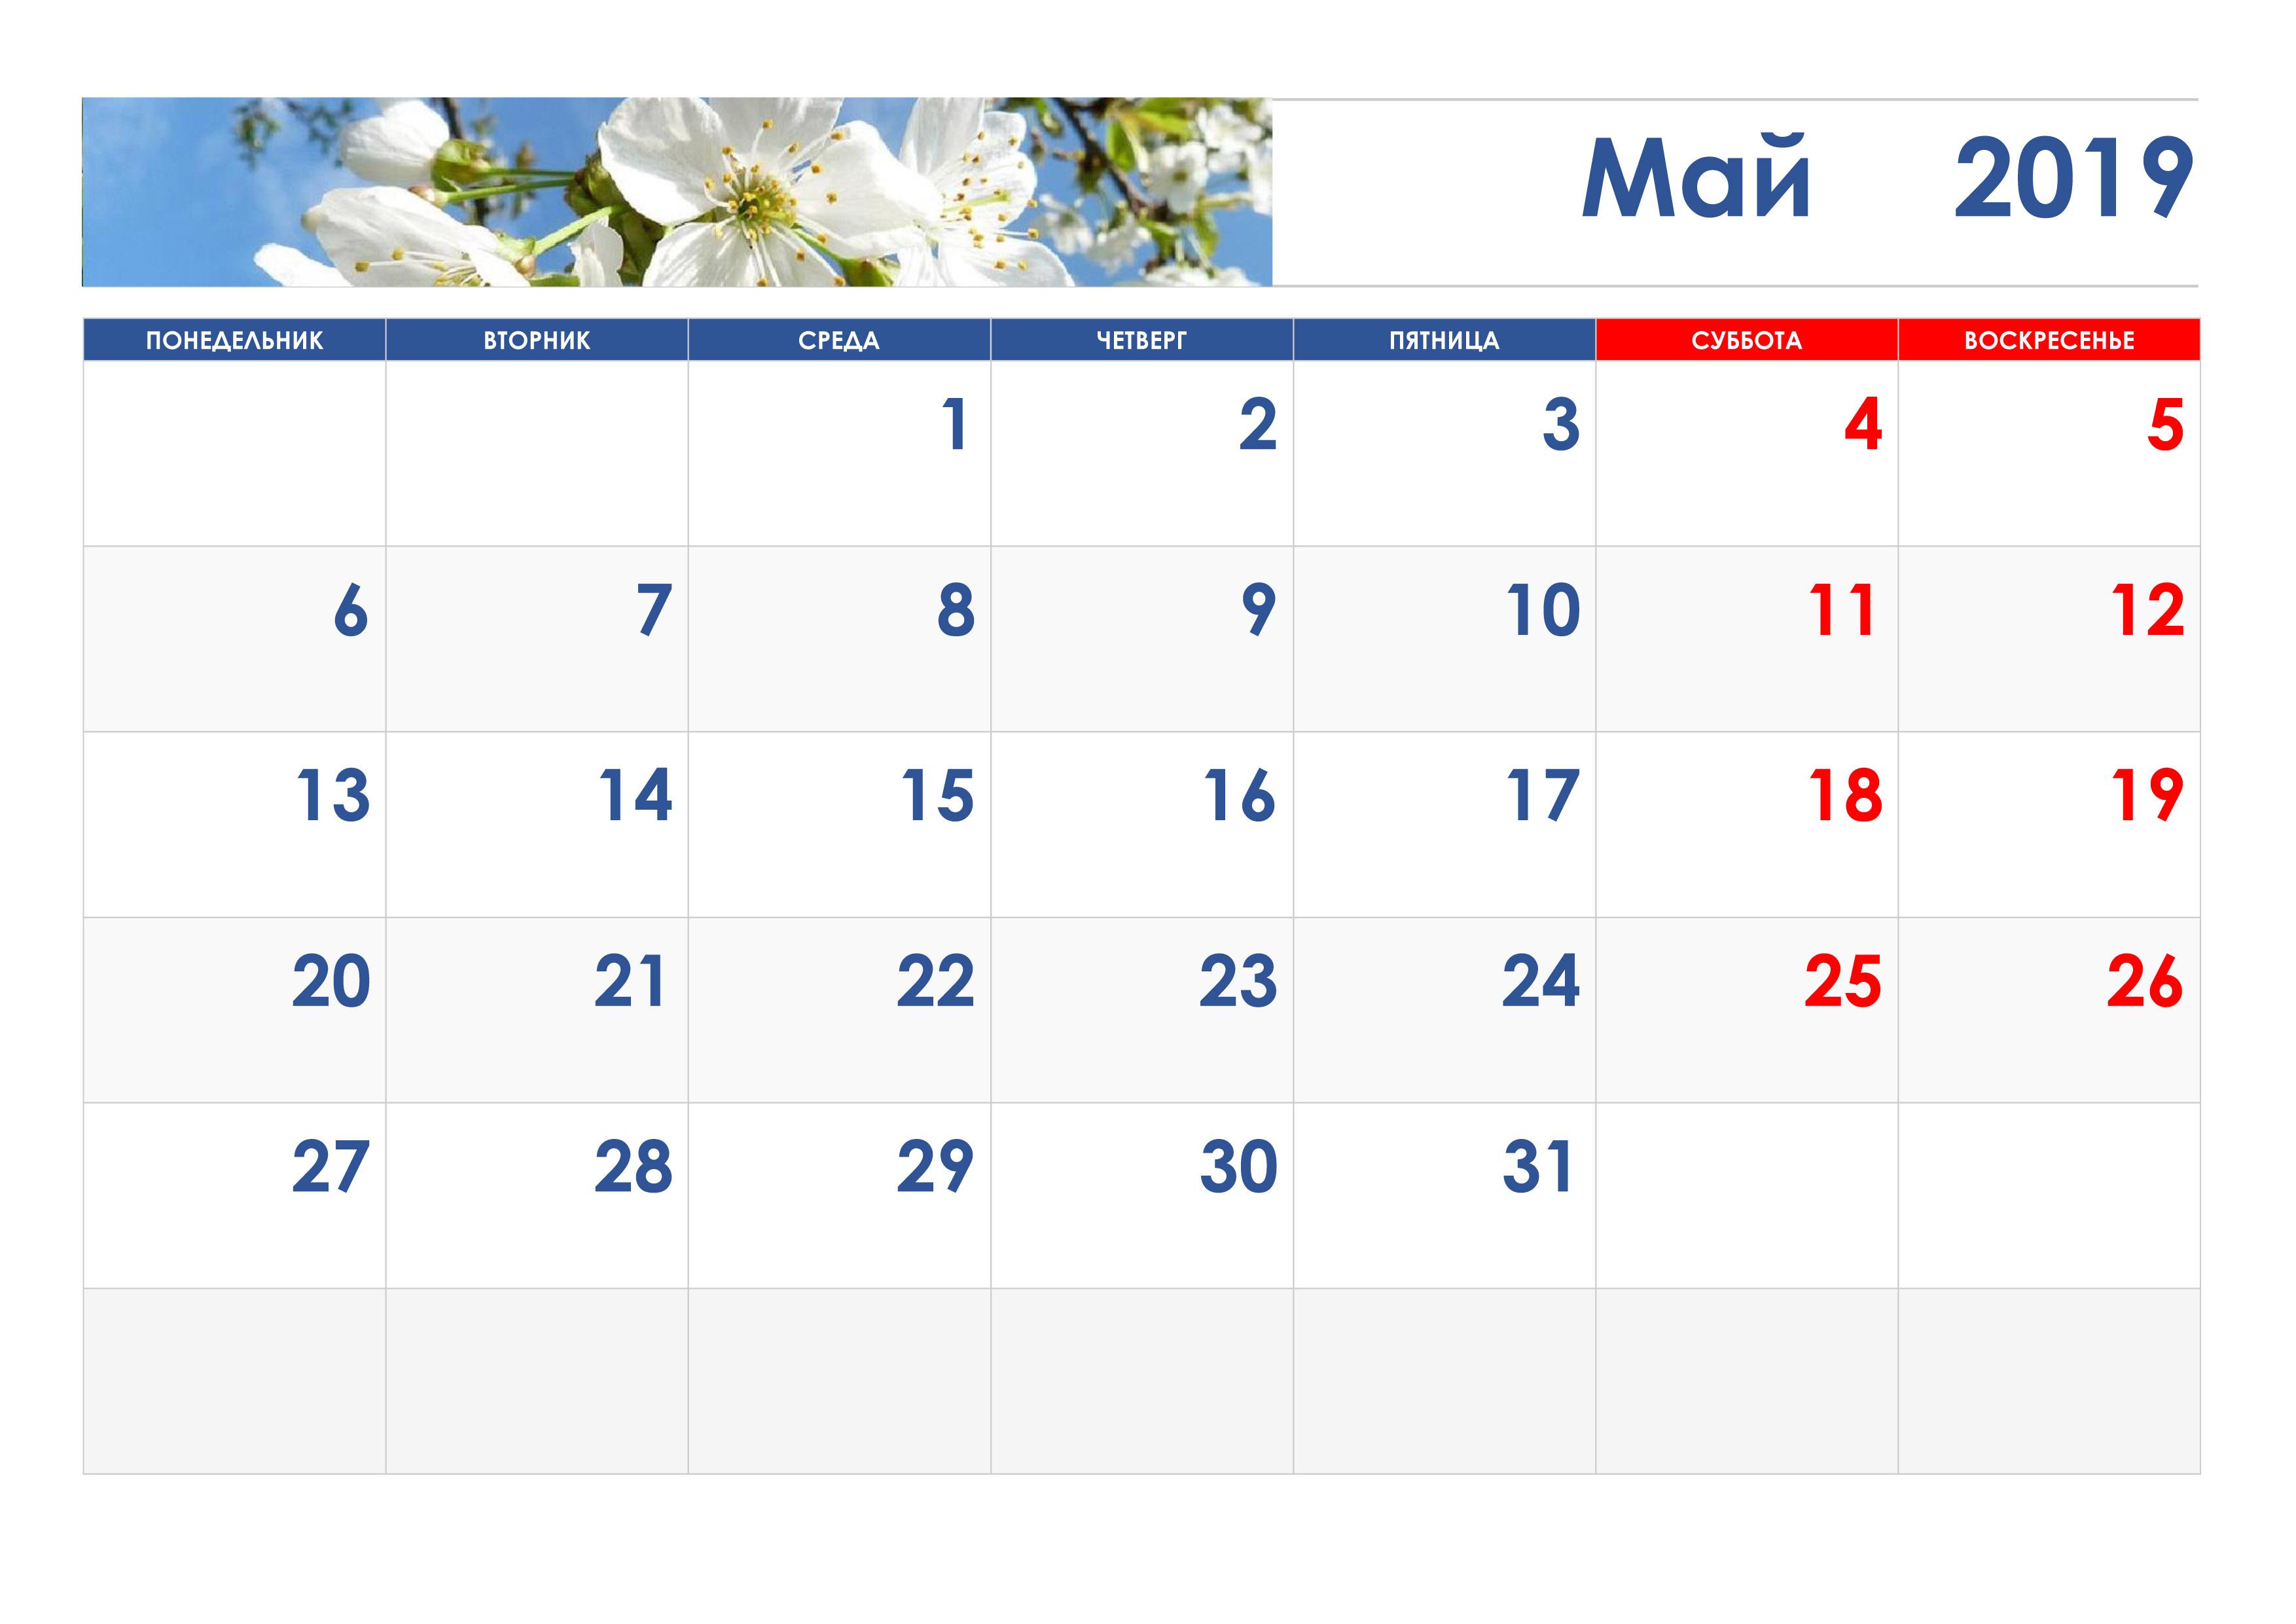 Май 2019 года календарь фото